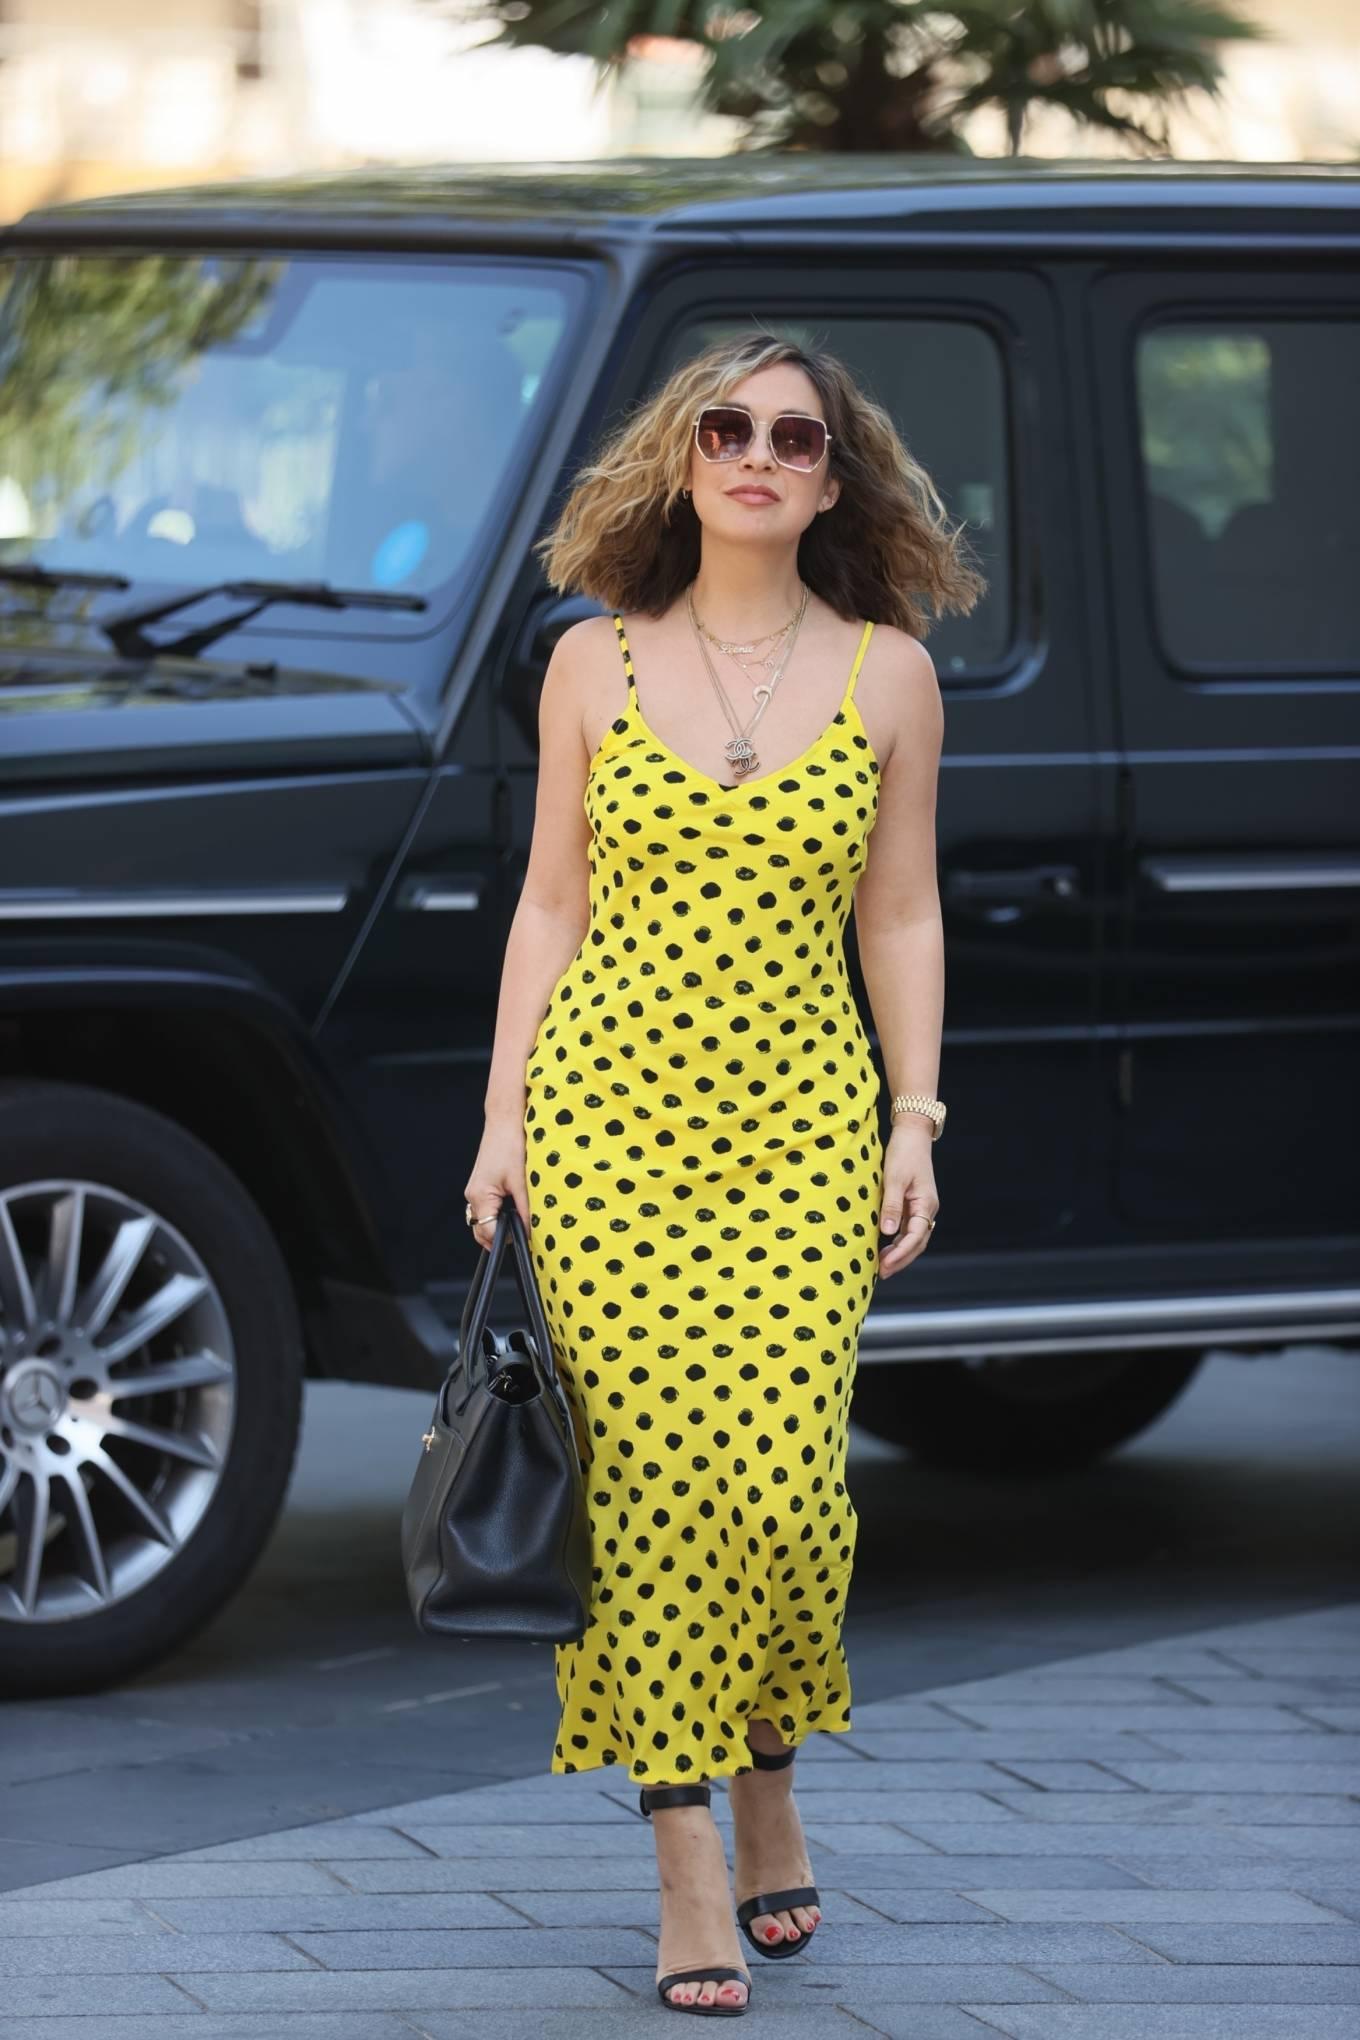 Myleene Klass 2020 : Myleene Klass – In yellow polka dot dress in London-17